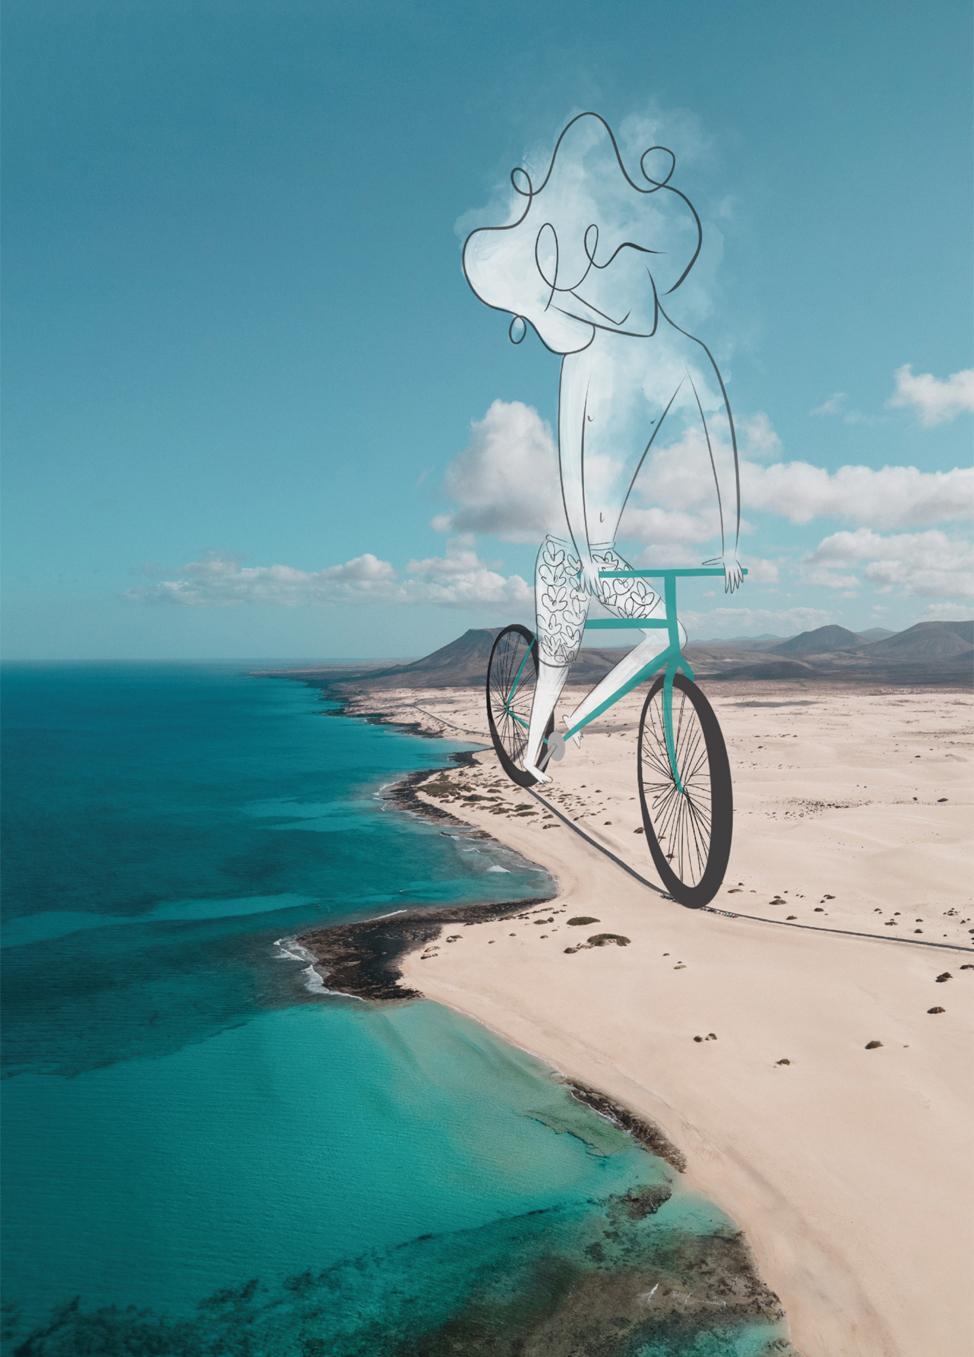 Exposición en Fuerteventura de Vititee   Macaronesia Fuerteventura